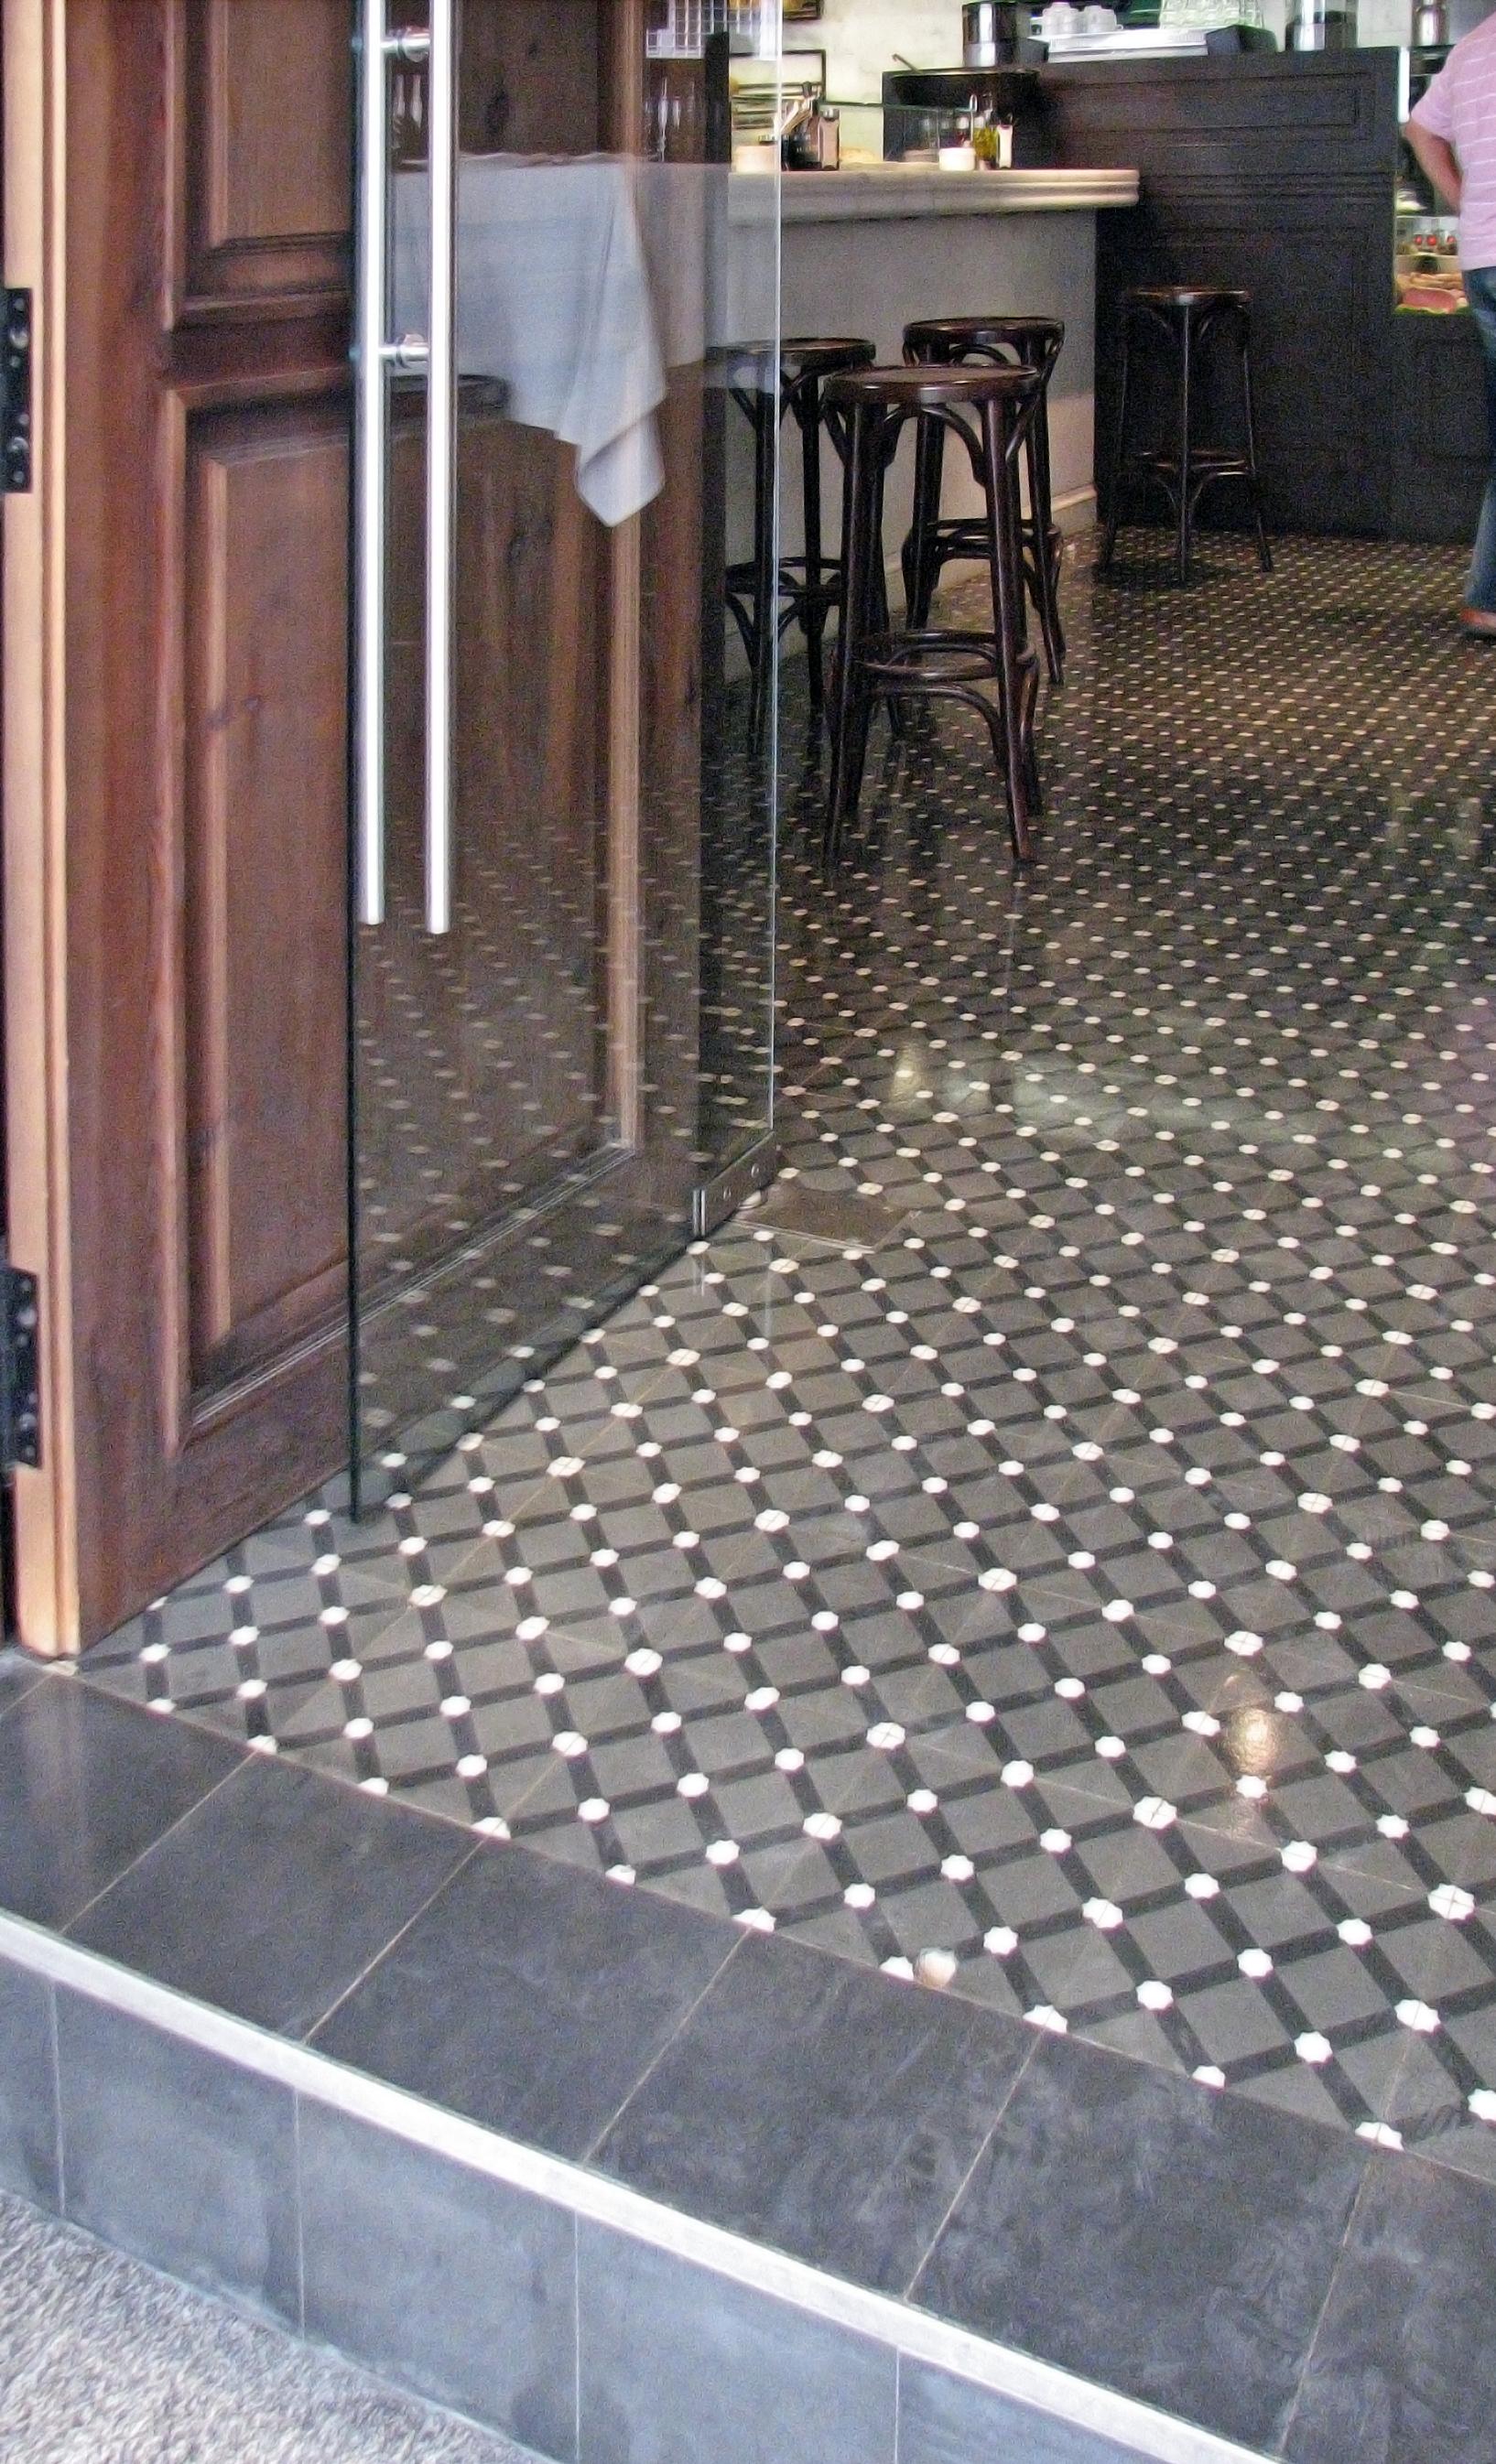 Zementfliesen im Restaurant